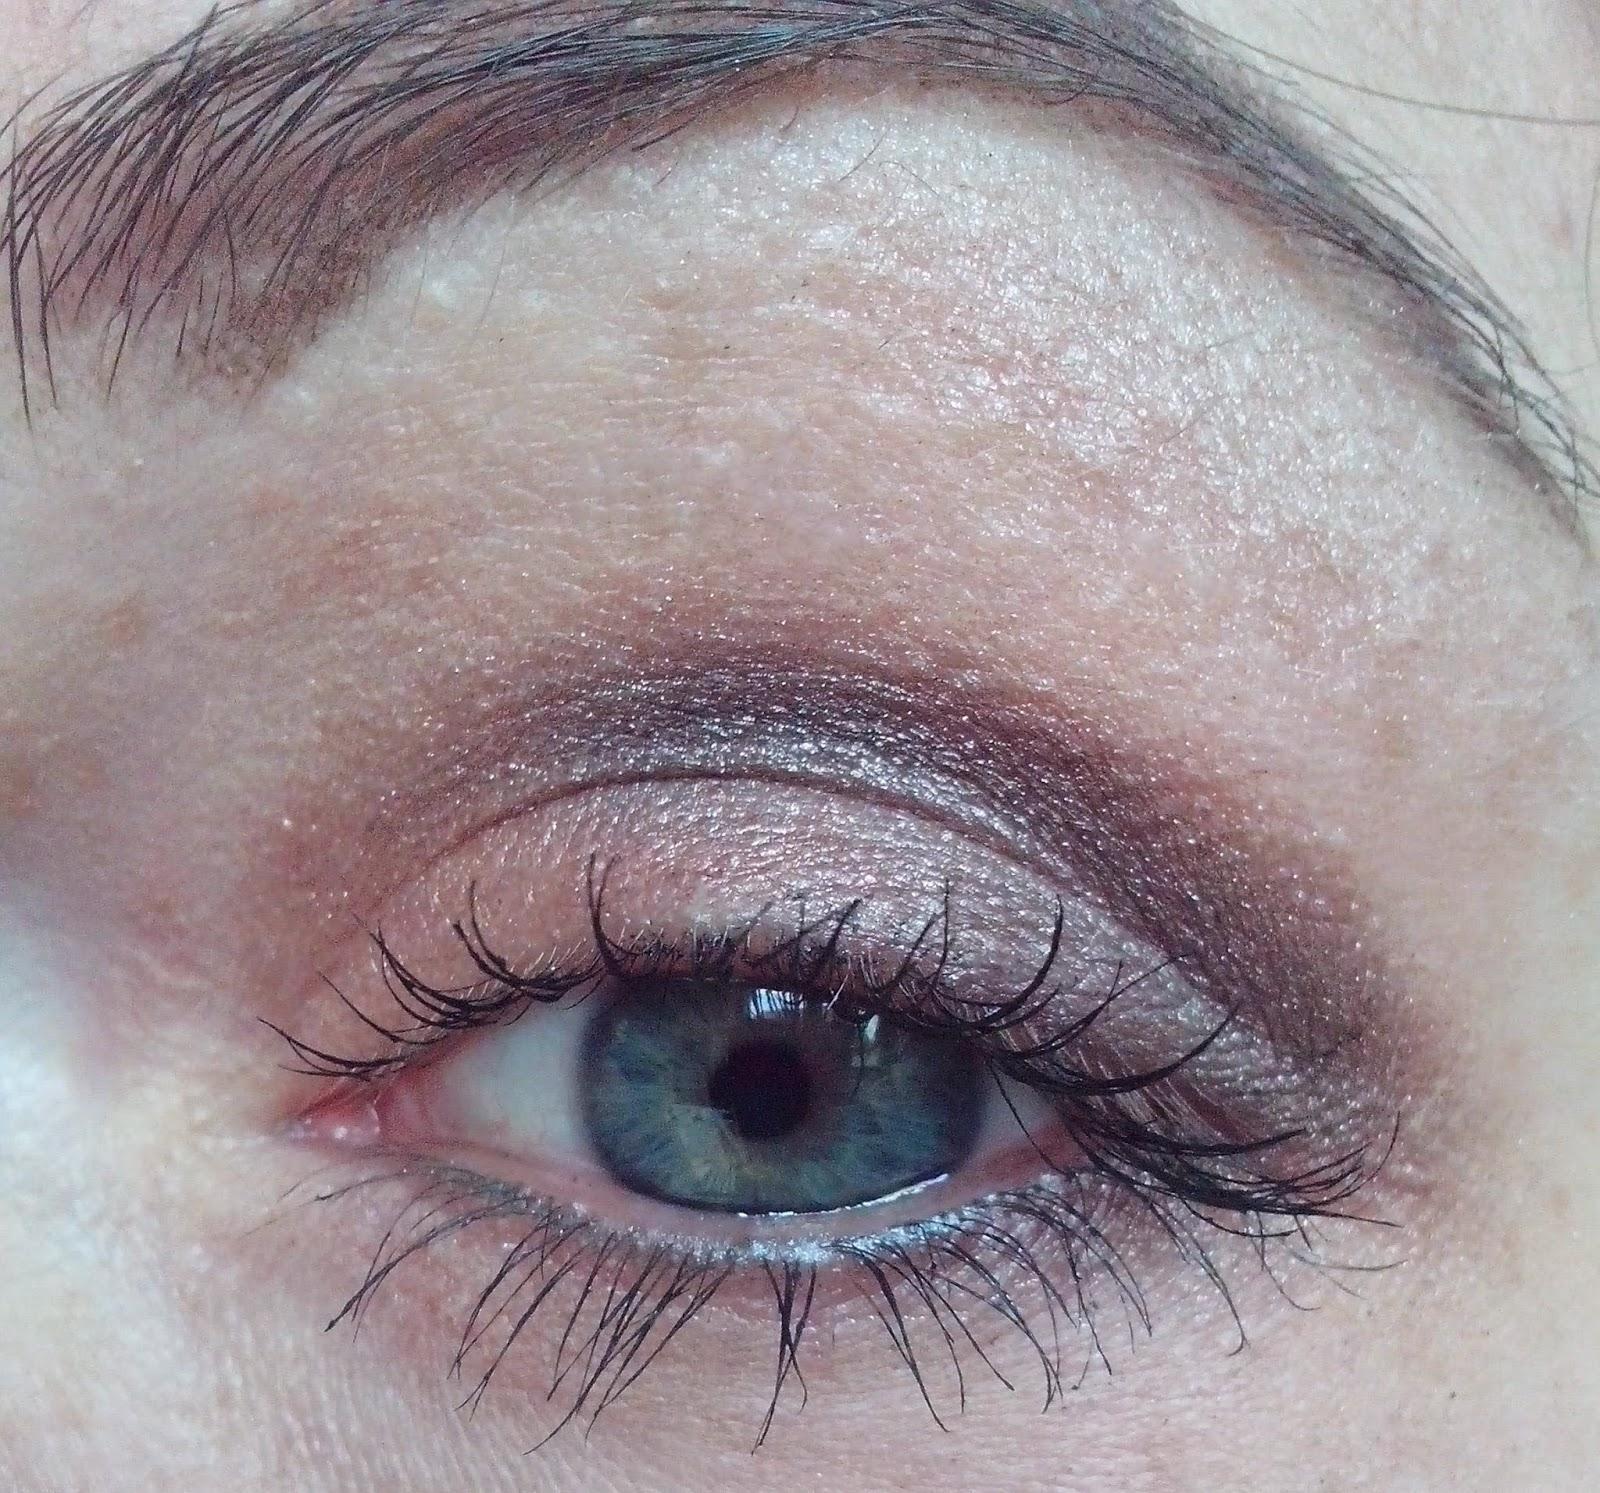 FOTD-essence-dare-to-wear-lipstick-catrice-gradation-blush-maxfactor-2000-calorie-mascara-beauty-women-nudes-eyeshadow-tedi-coastal-scents-essence-bloom-me-up-natventurista-brushes-eye